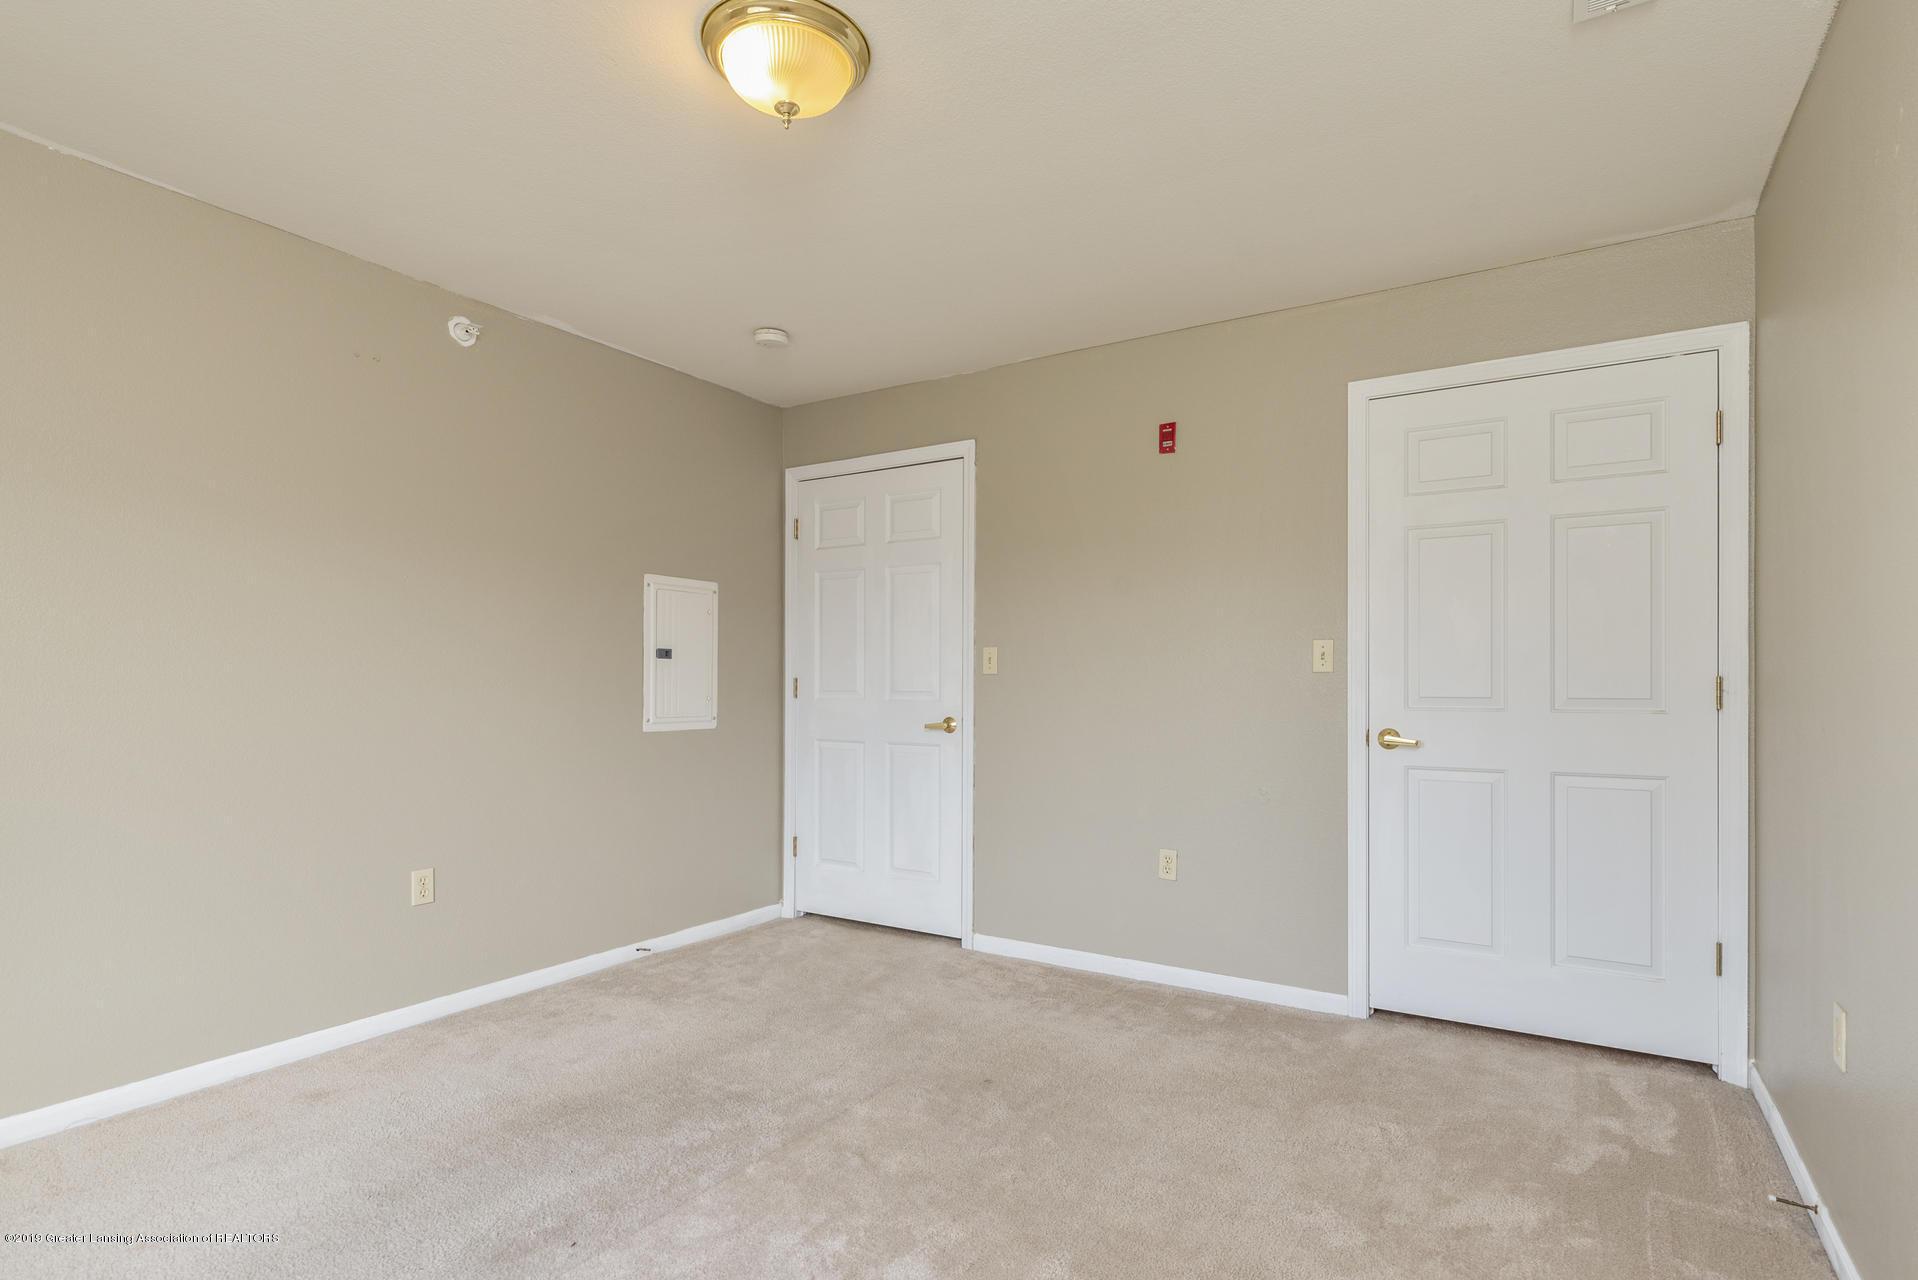 338 W Saginaw St UNIT 44 - 014-photo-bedroom-7483694 - 15